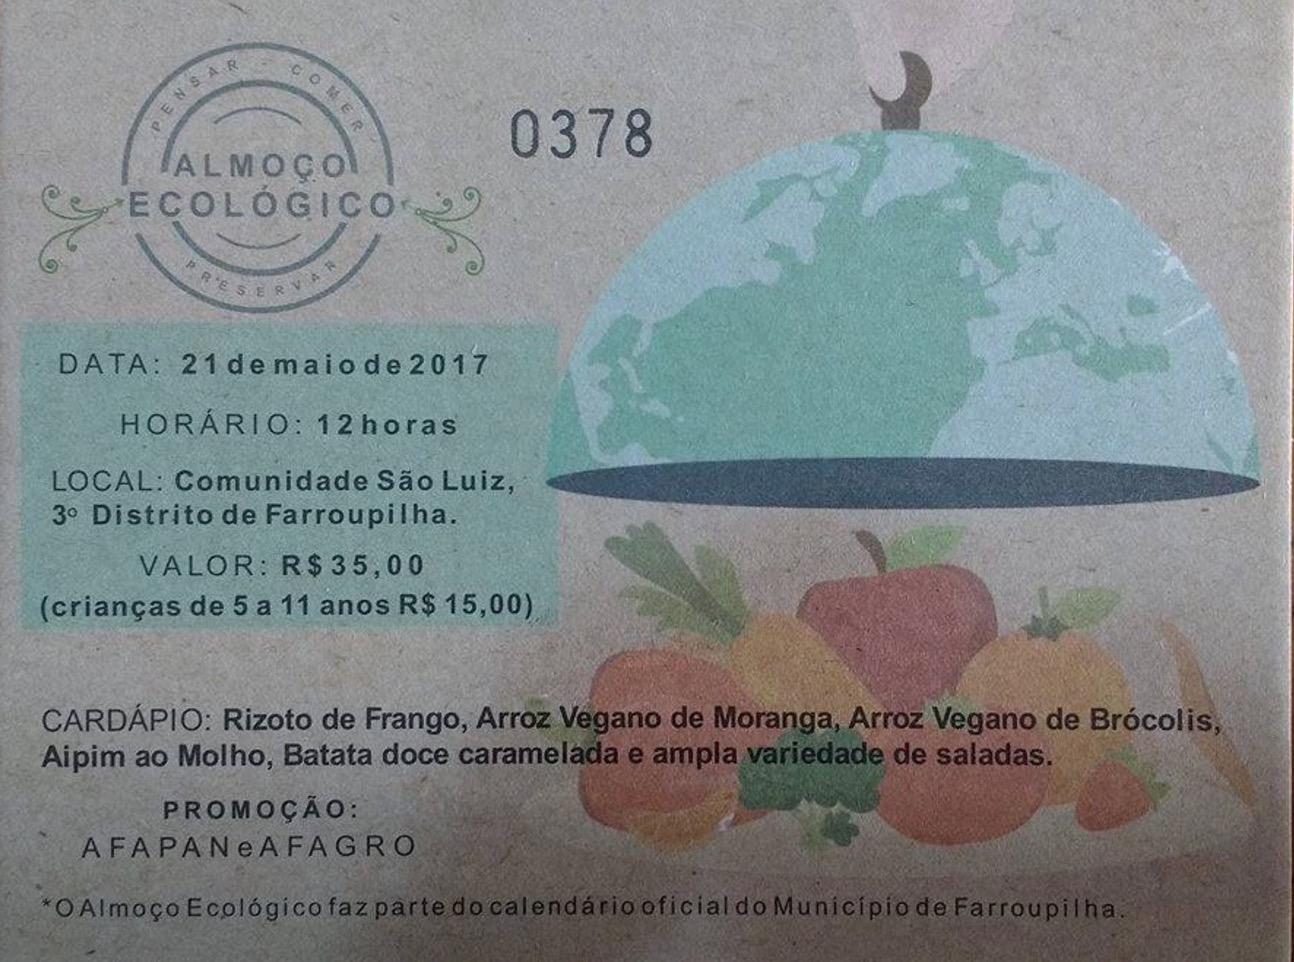 AFAPAN realiza Almoço Ecológico em Farroupilha dia 21/5/2017